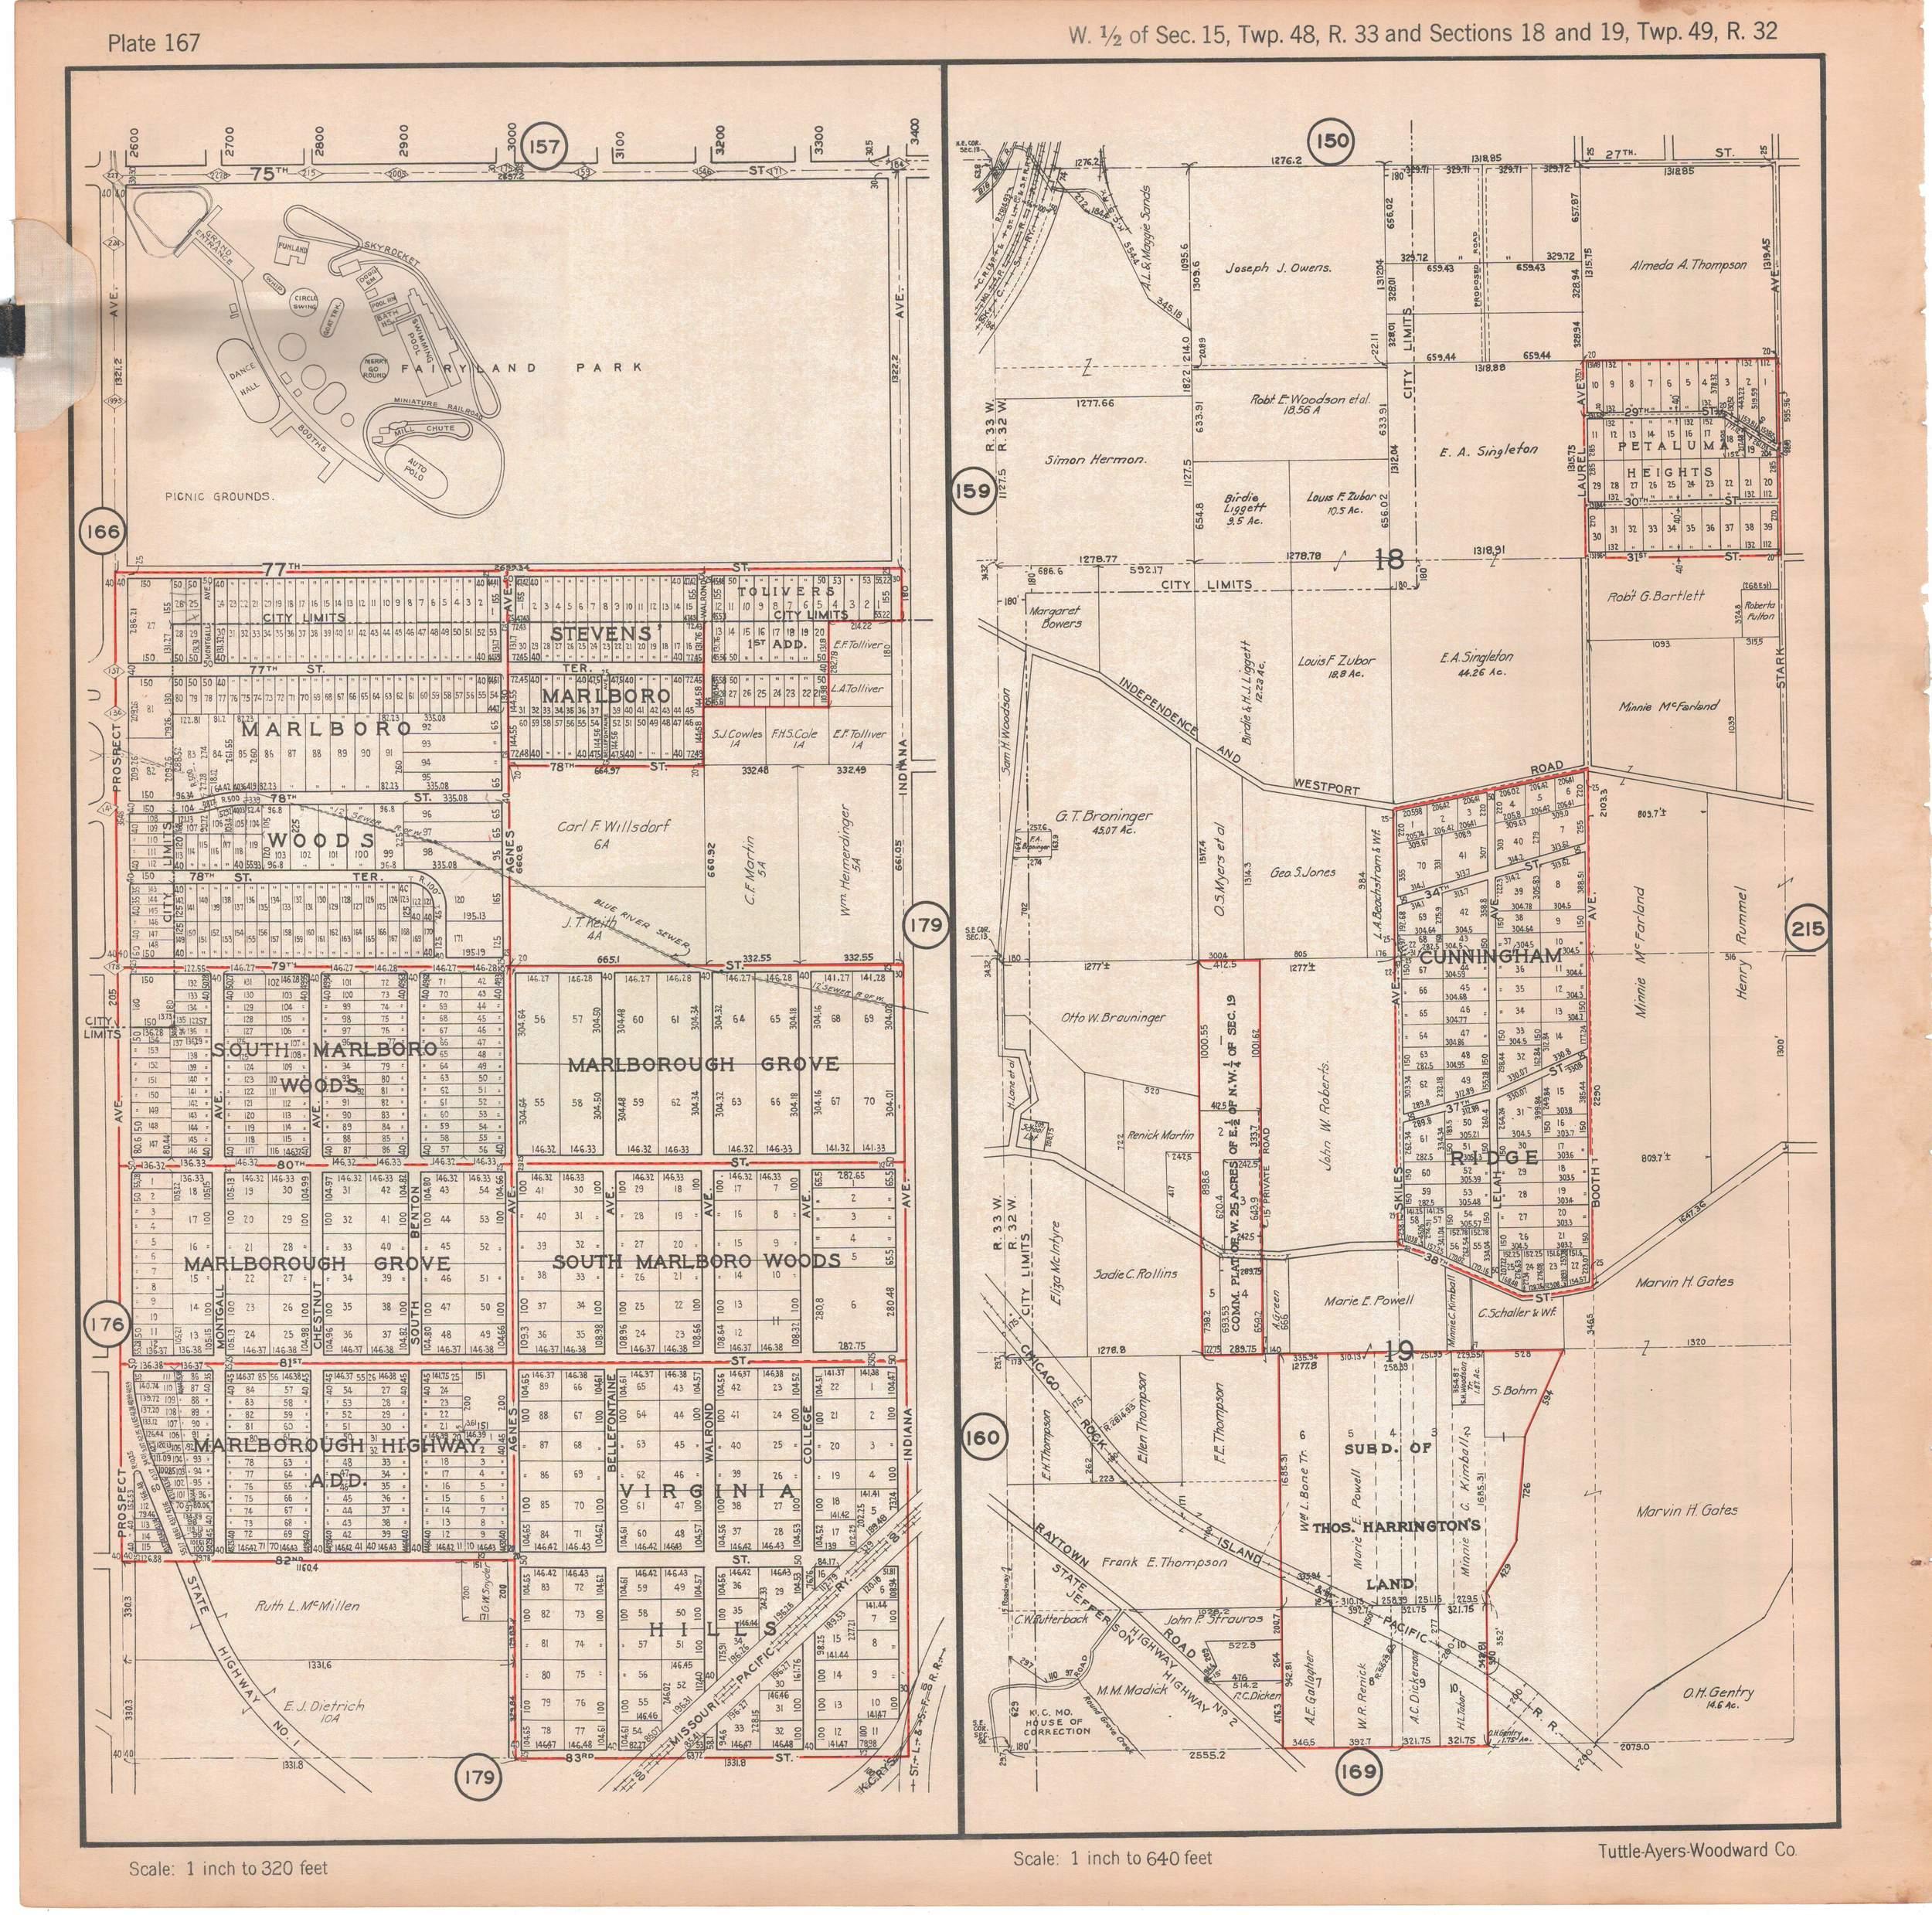 1925 TUTTLE_AYERS_Plate_167.JPG